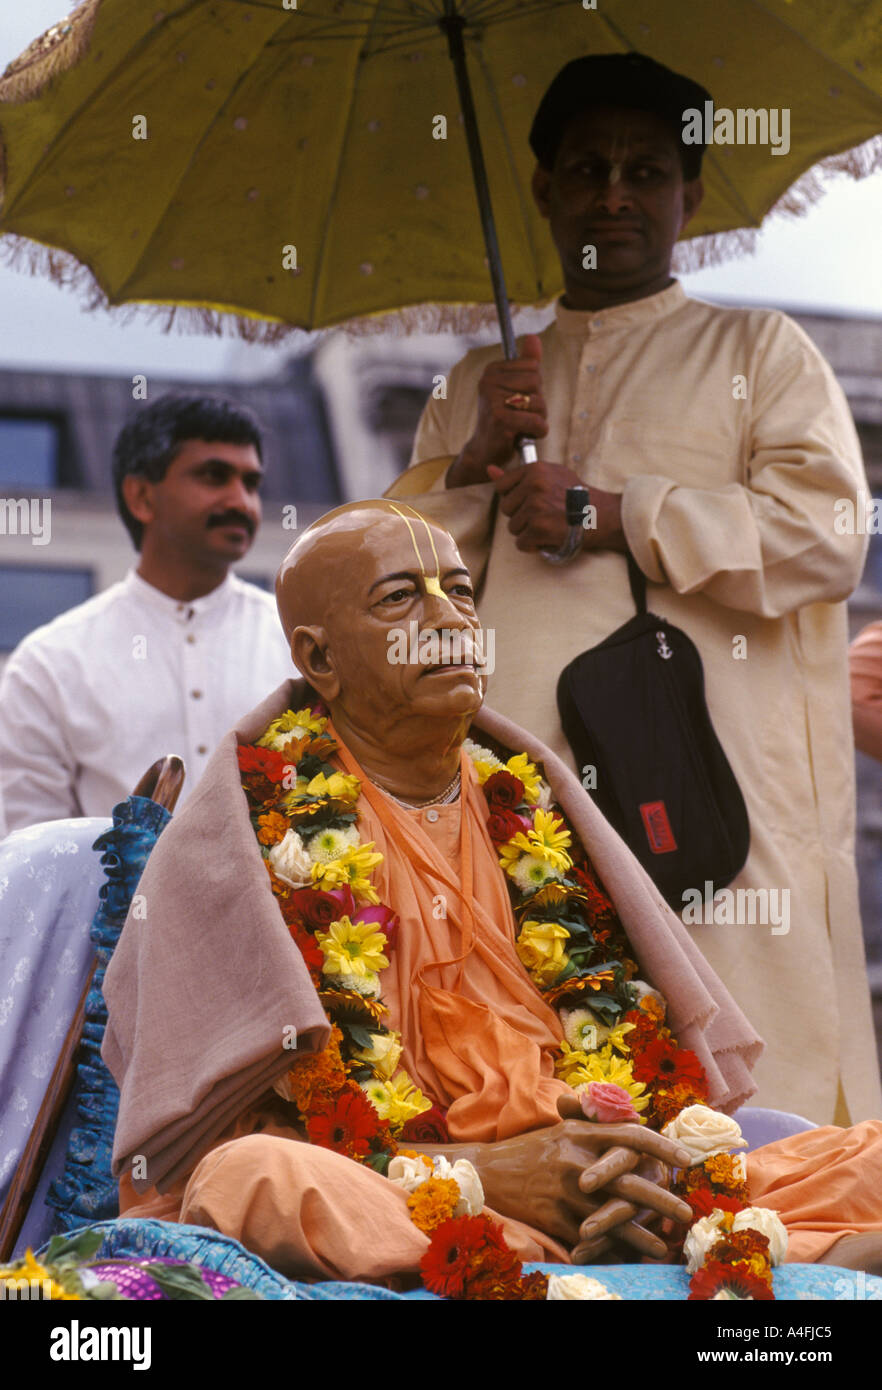 Hindu Festival London Hare Krishna RATHAYATRA  Krishna Devotees  Radha Krishna Devotees gather in Trafalgar Square - Stock Image